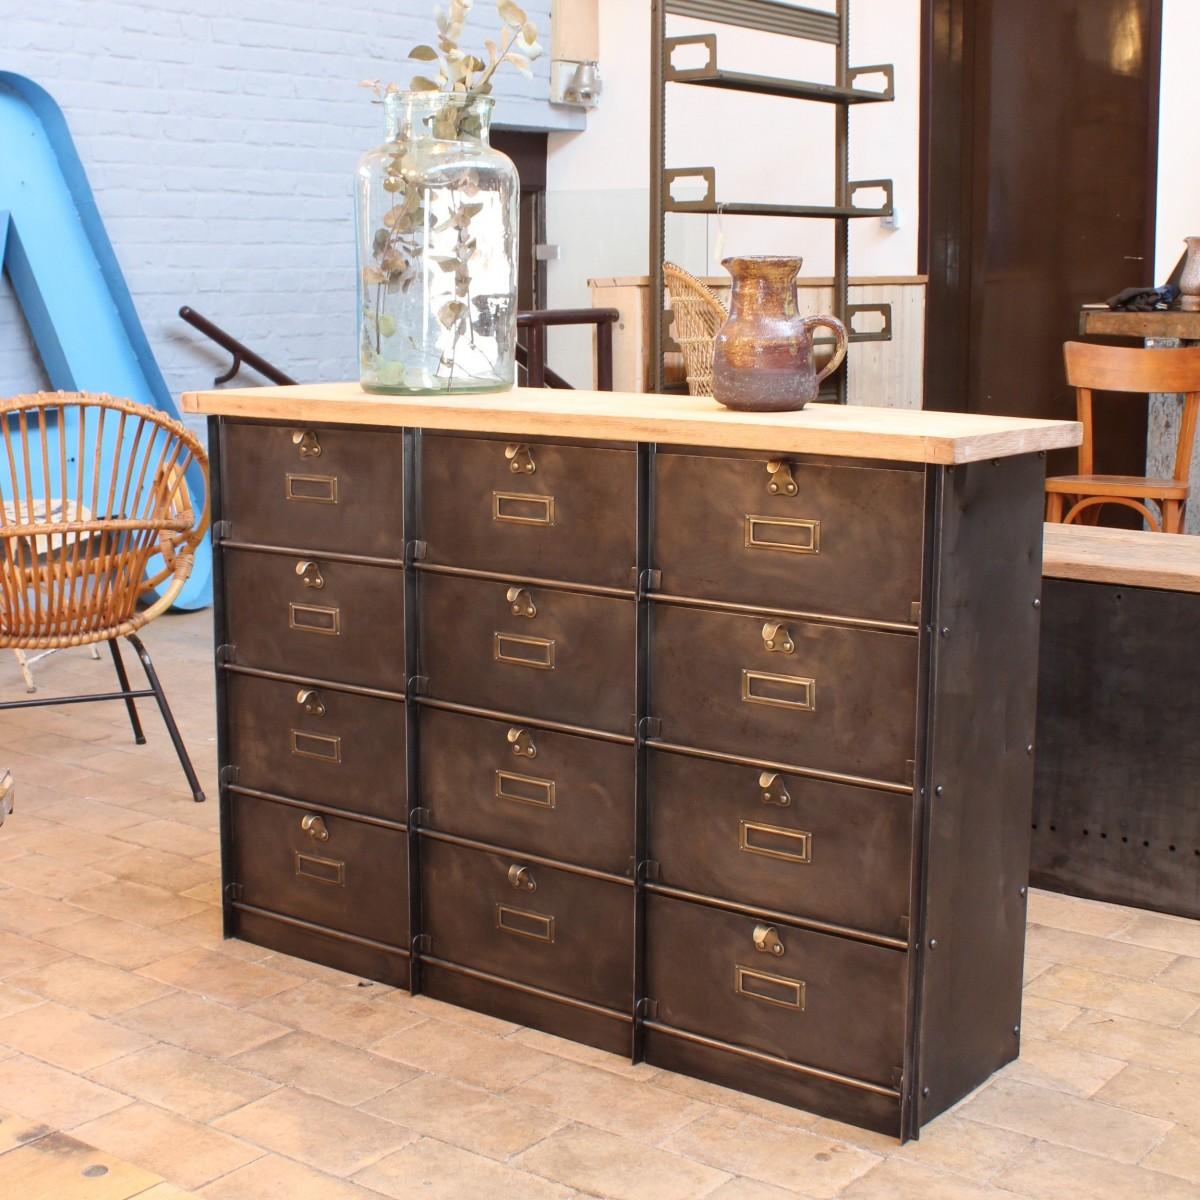 ancien meuble clapets. Black Bedroom Furniture Sets. Home Design Ideas